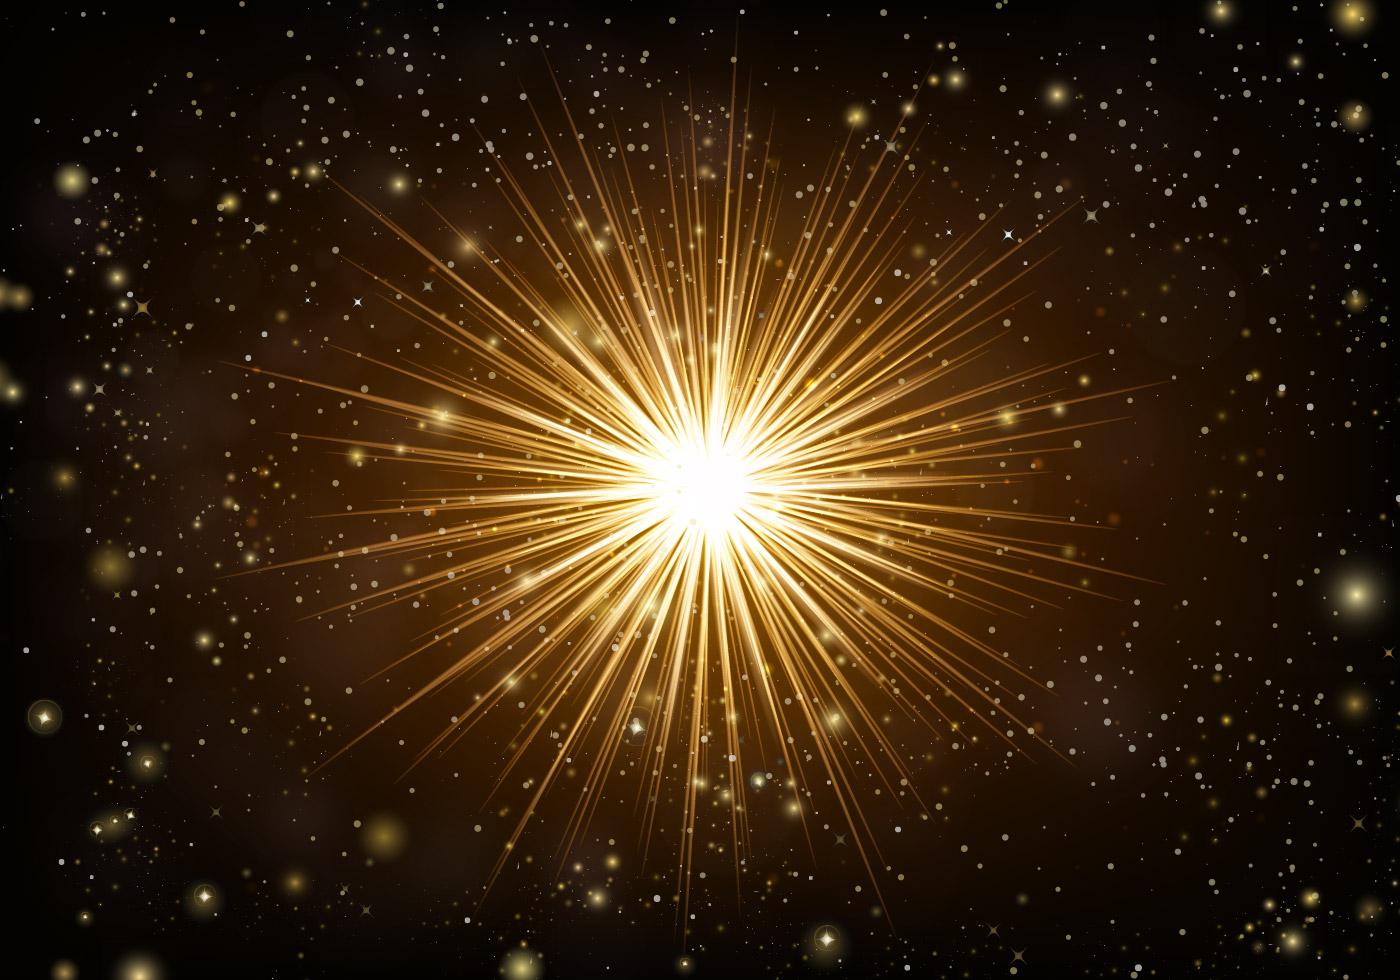 Hd Wallpaper Diwali Light Vector Supernova Background Download Free Vector Art